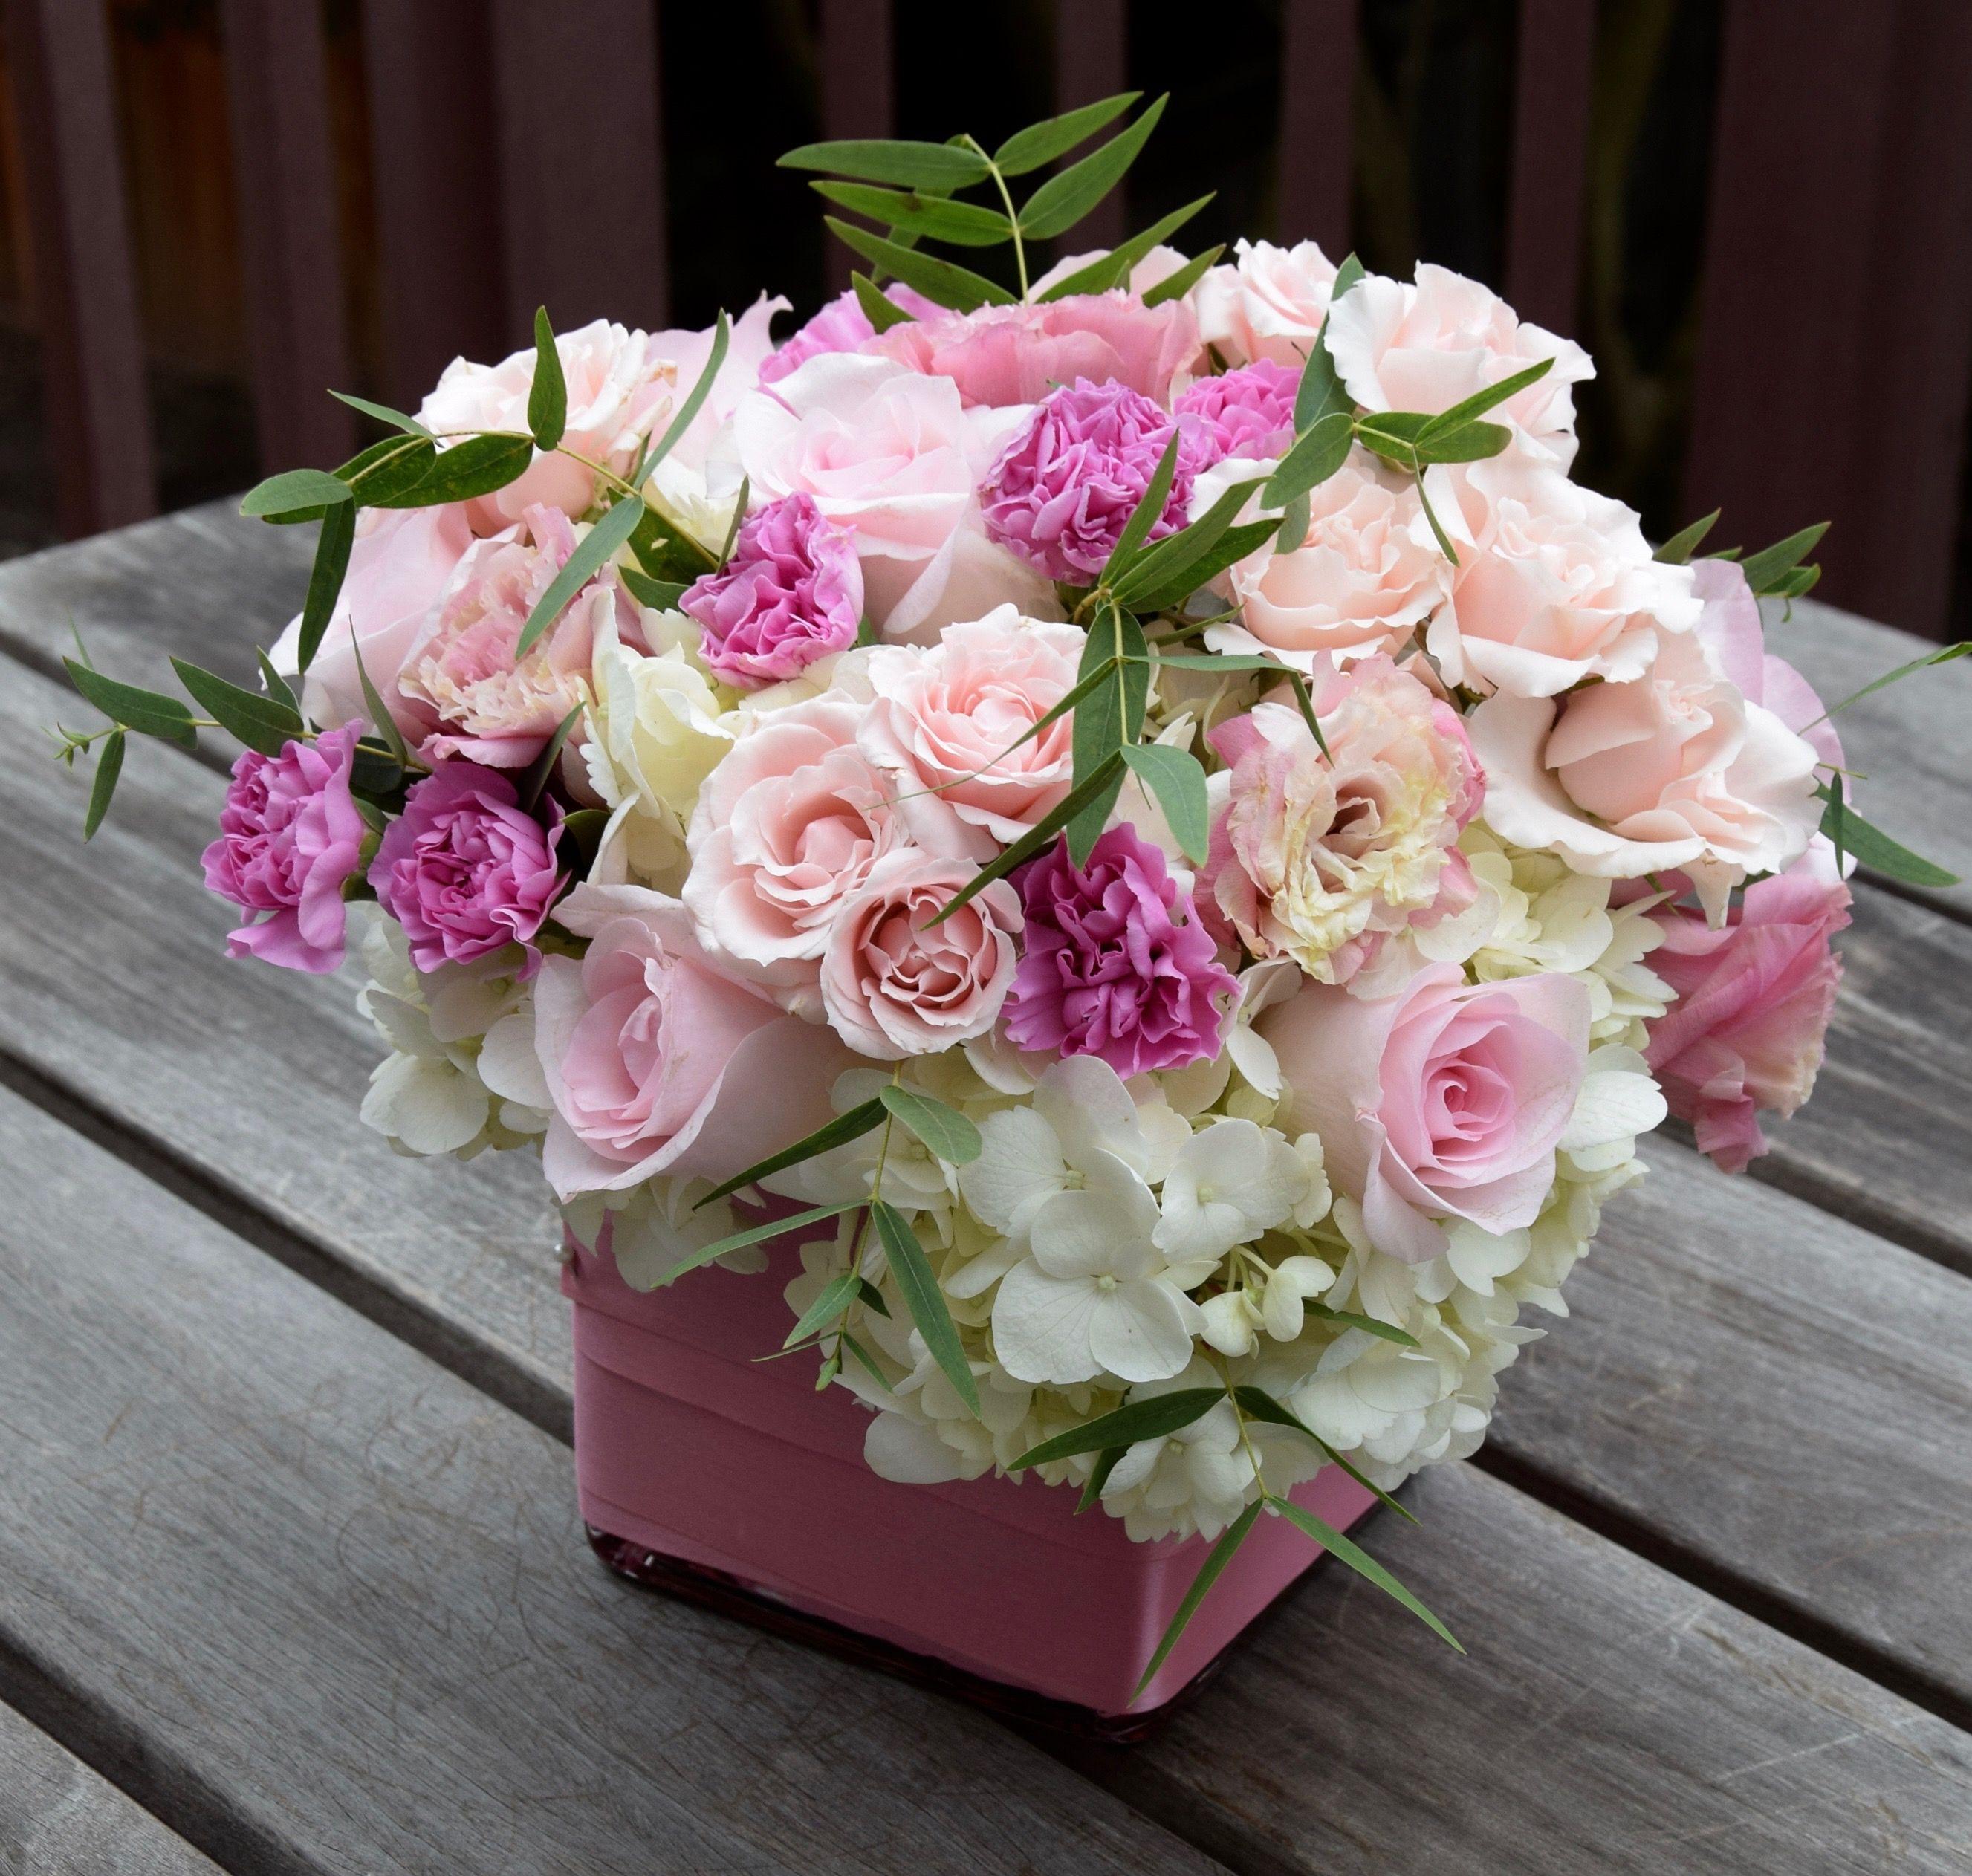 Sweet Pink Flower Arrangement With Roses Lisianthus Hydrangeas Mini Carnations Flower Arrangements Pink Flower Arrangements Flowers